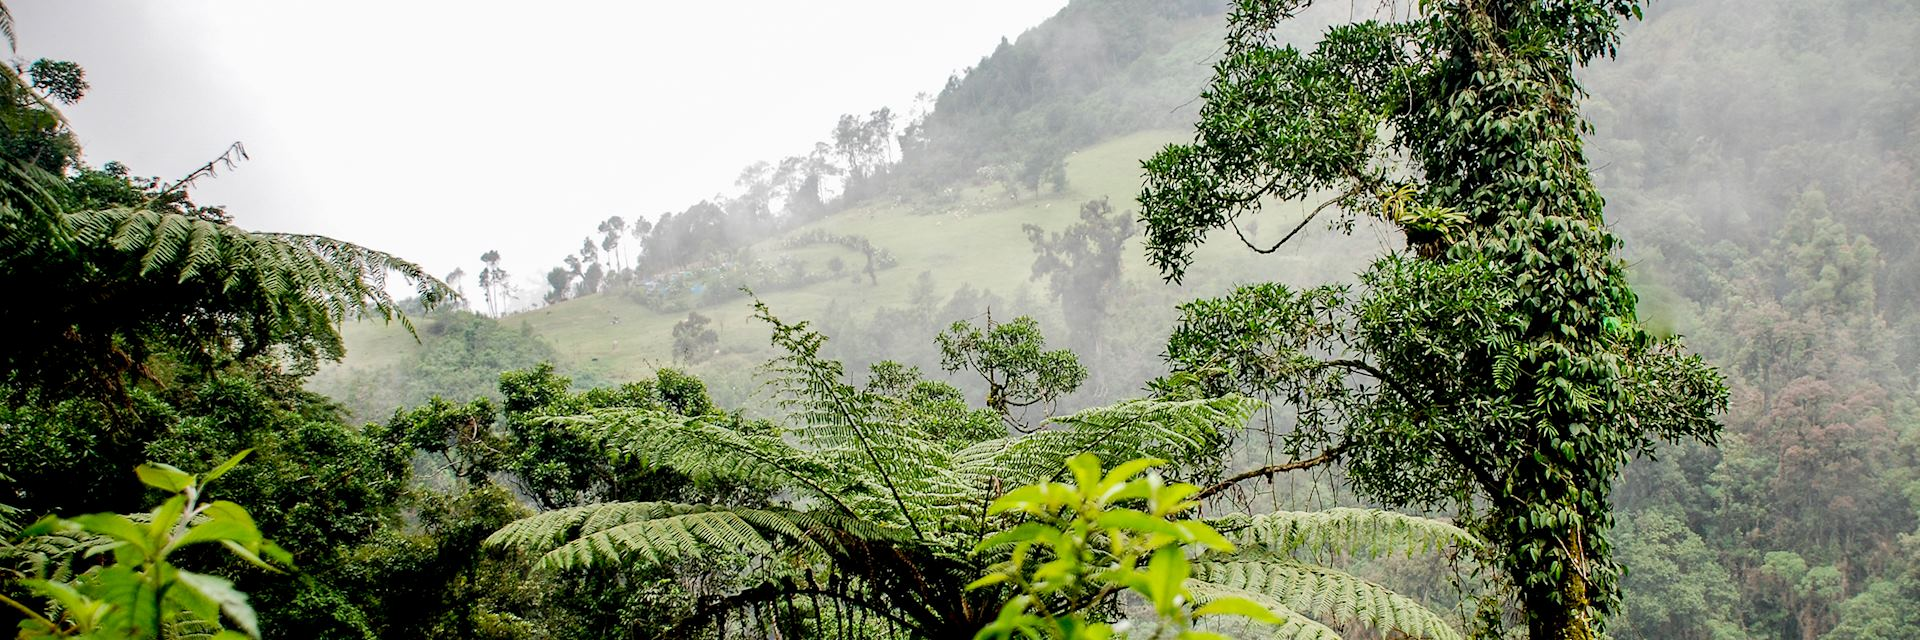 Countryside surrounding Tapachula